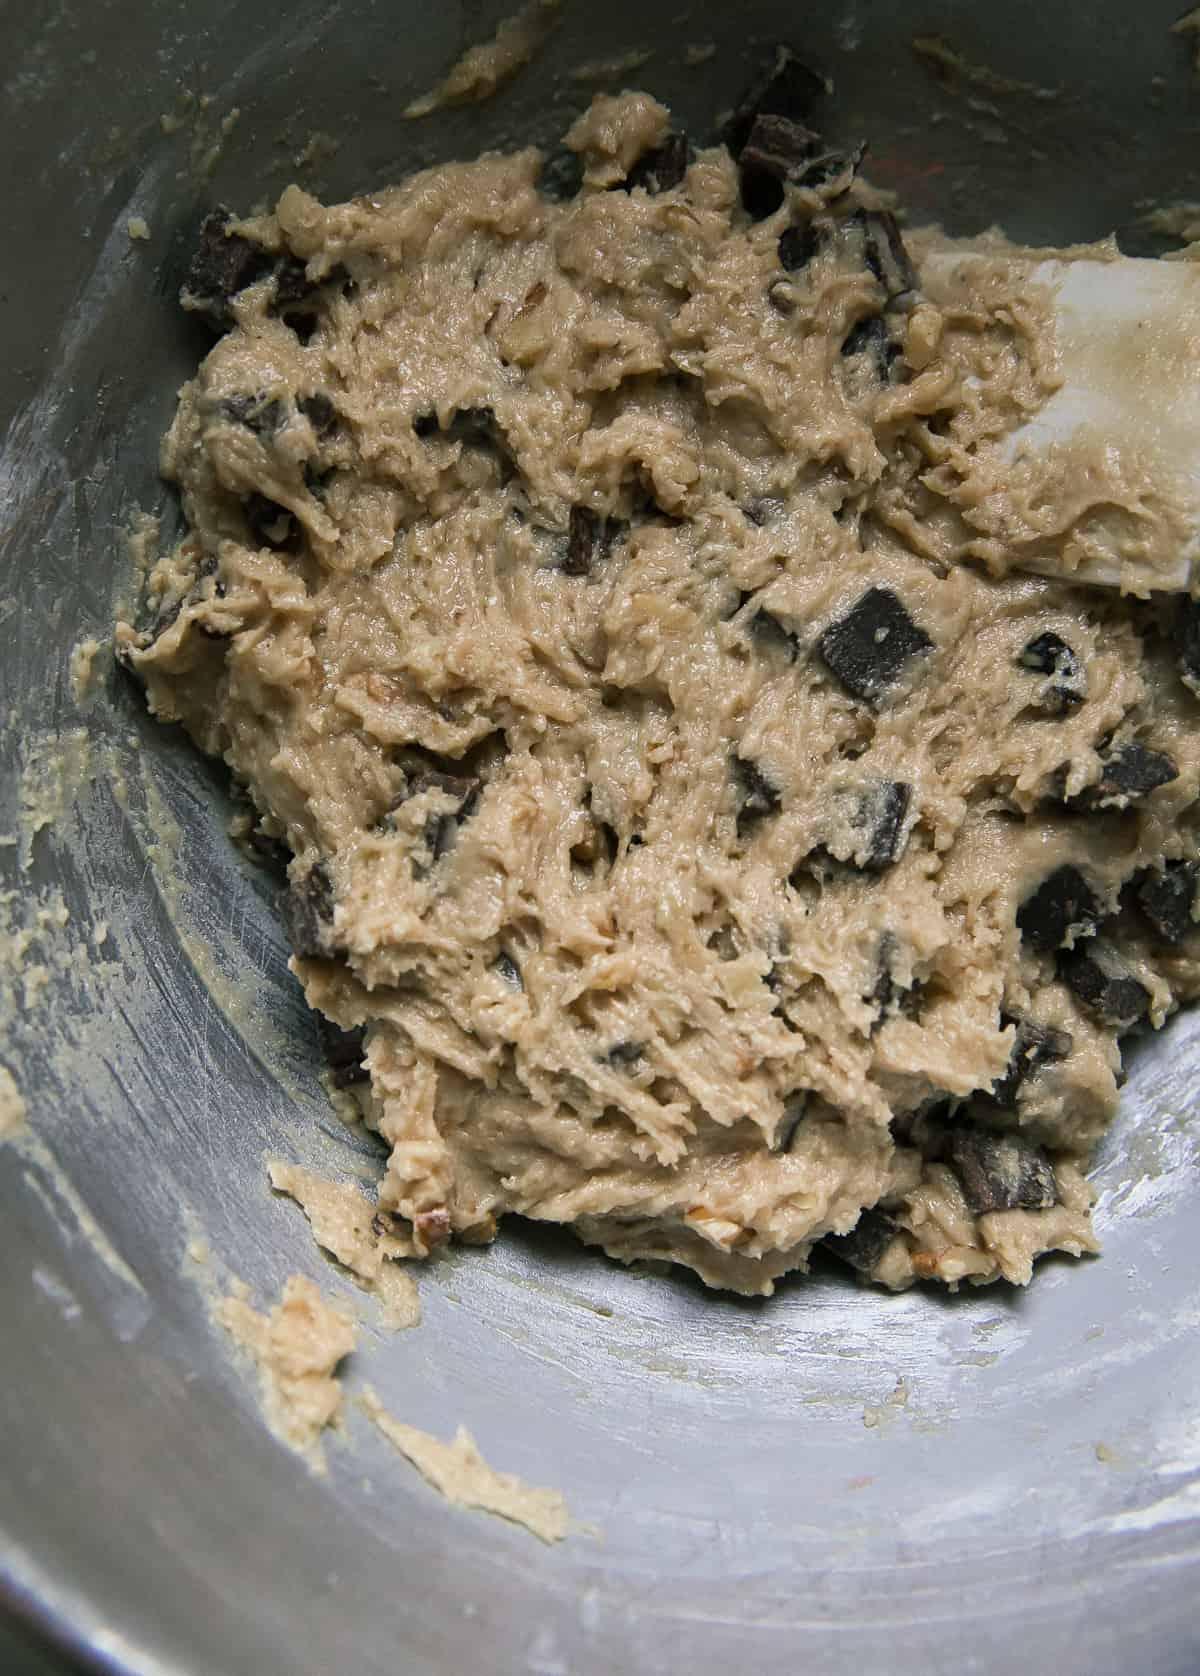 Dough for Banana Chocolate Chip Cookies